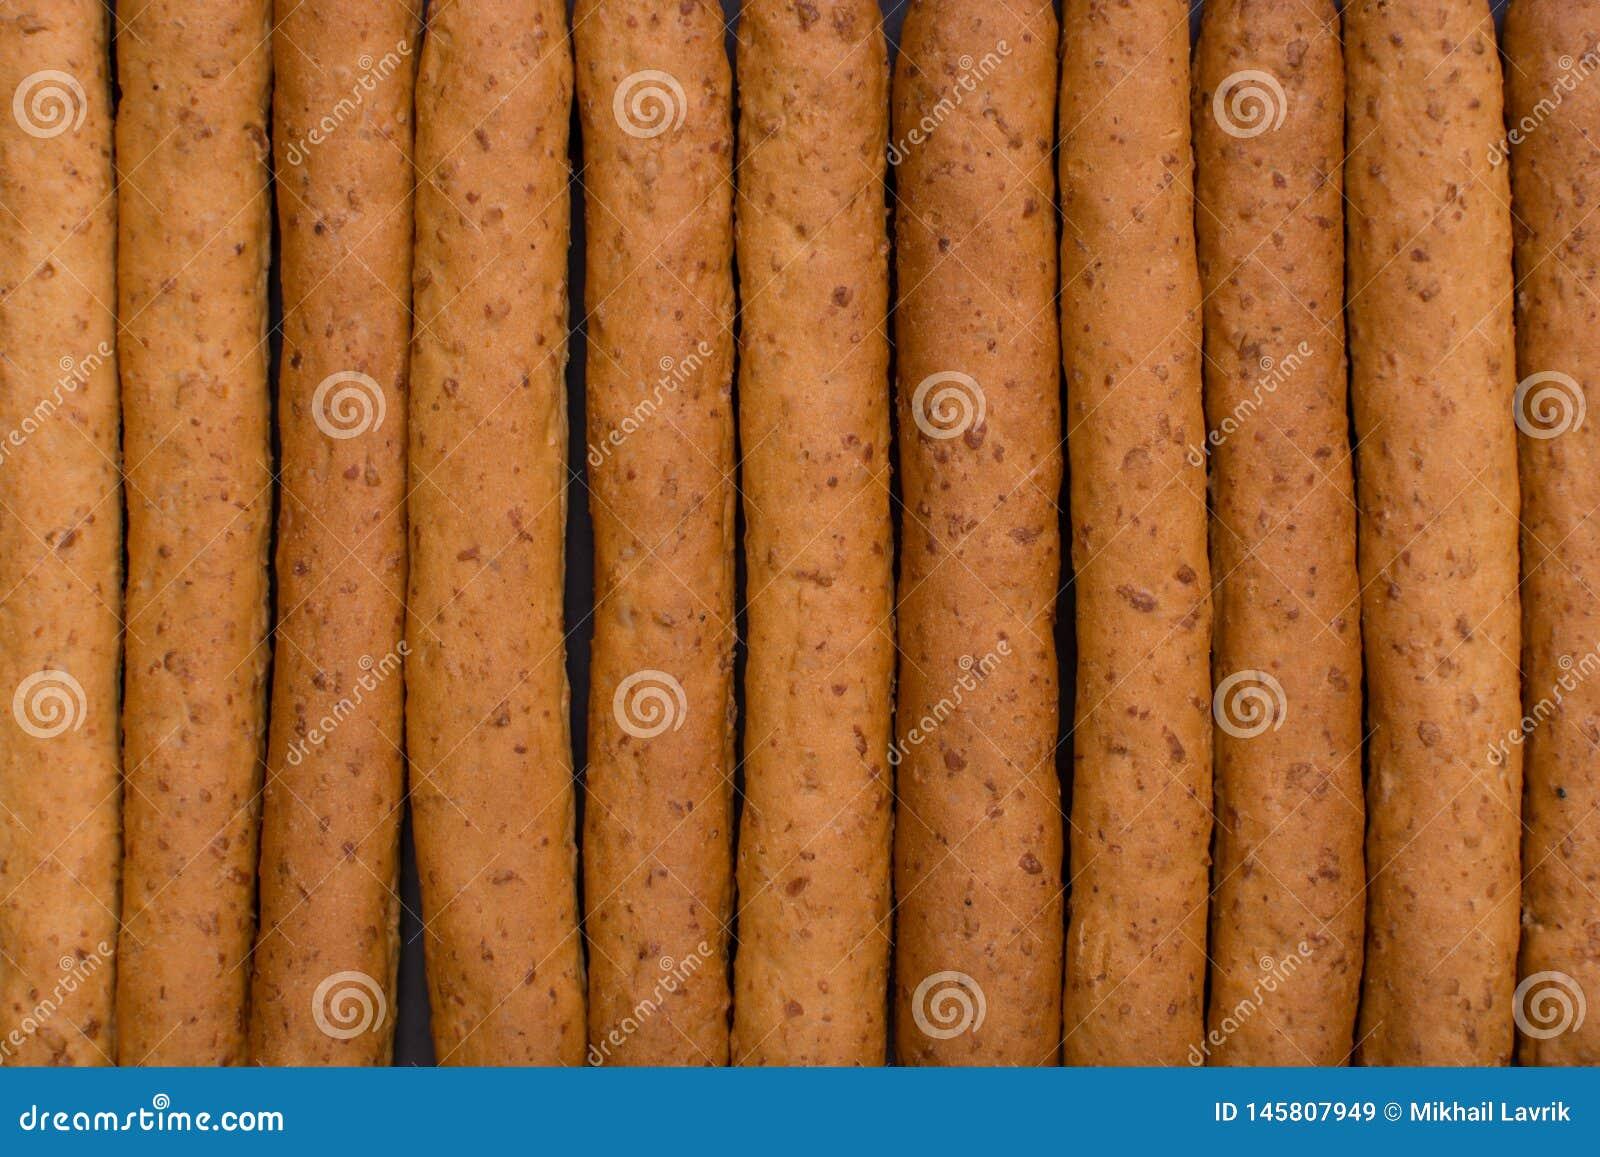 Crispy bread sticks. Top view